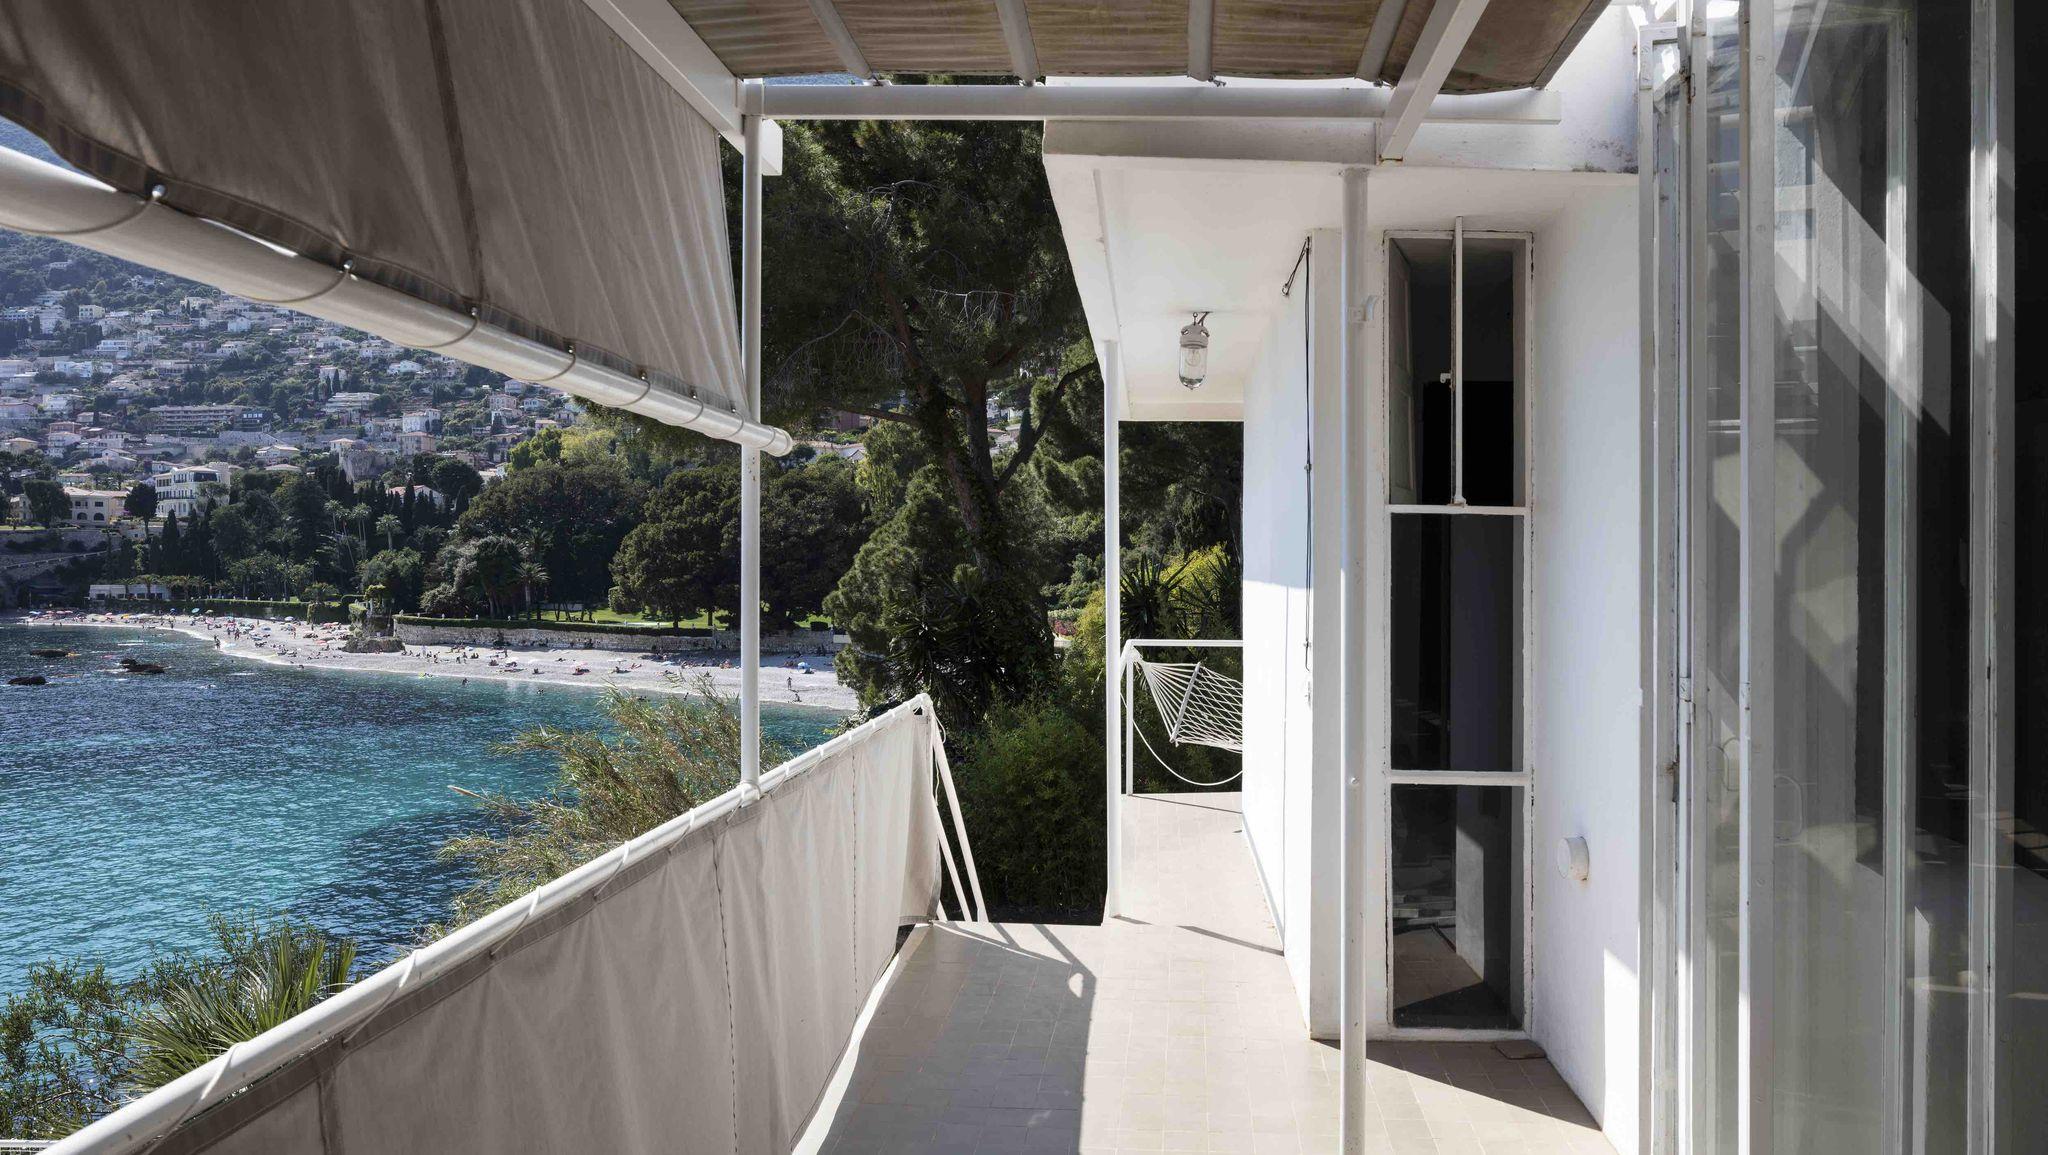 Villa E-1027, Eileen Gray's Masterpiece Defaced by Le Corbusier